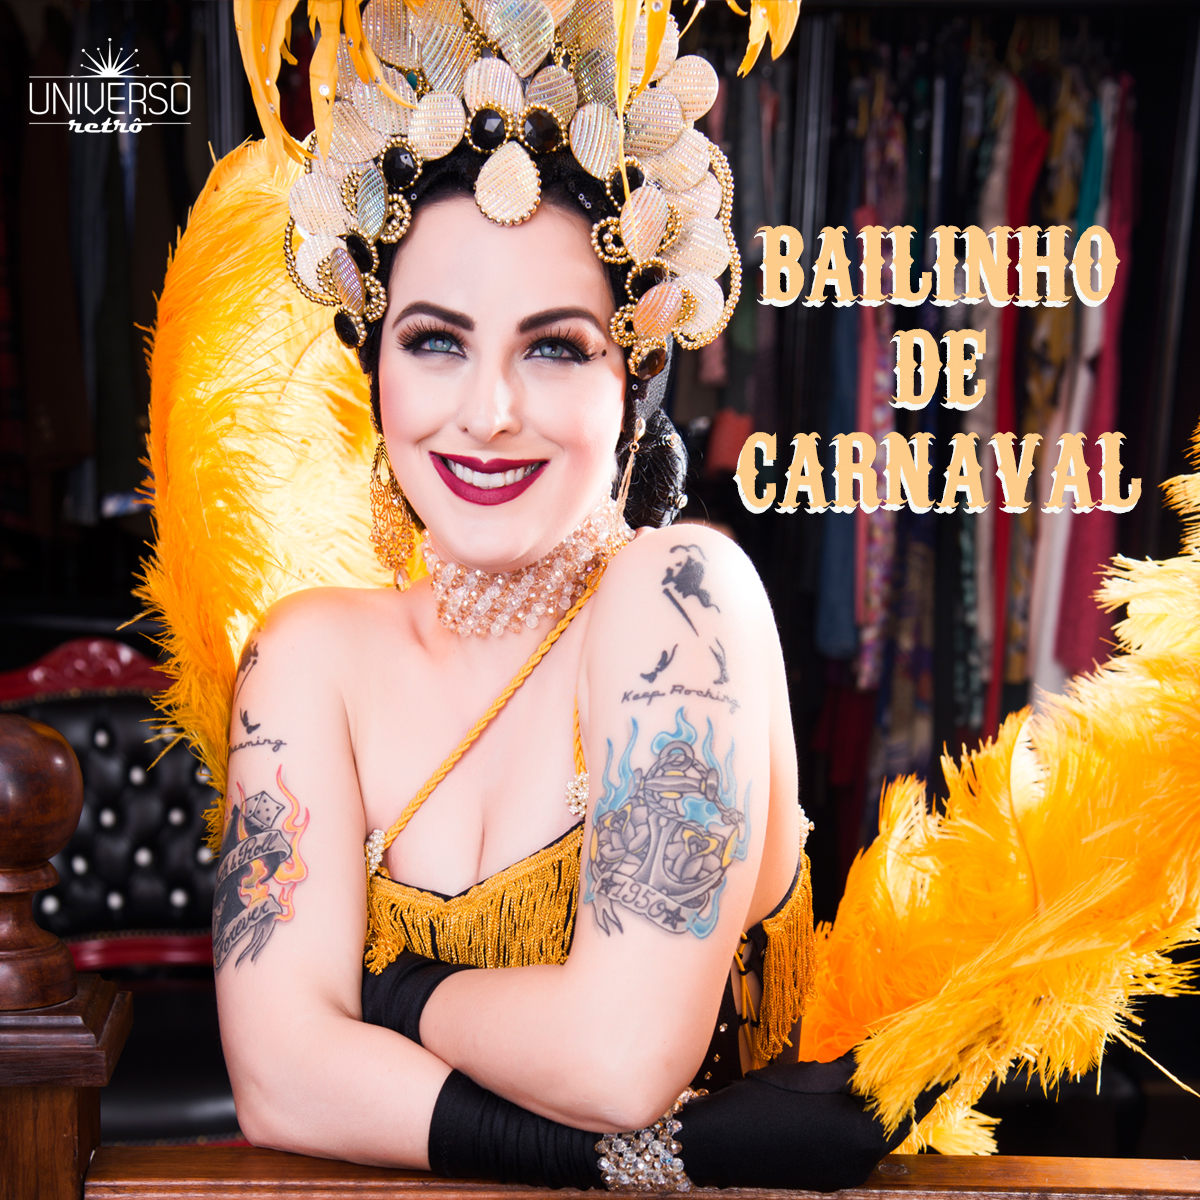 Playlist de Carnaval